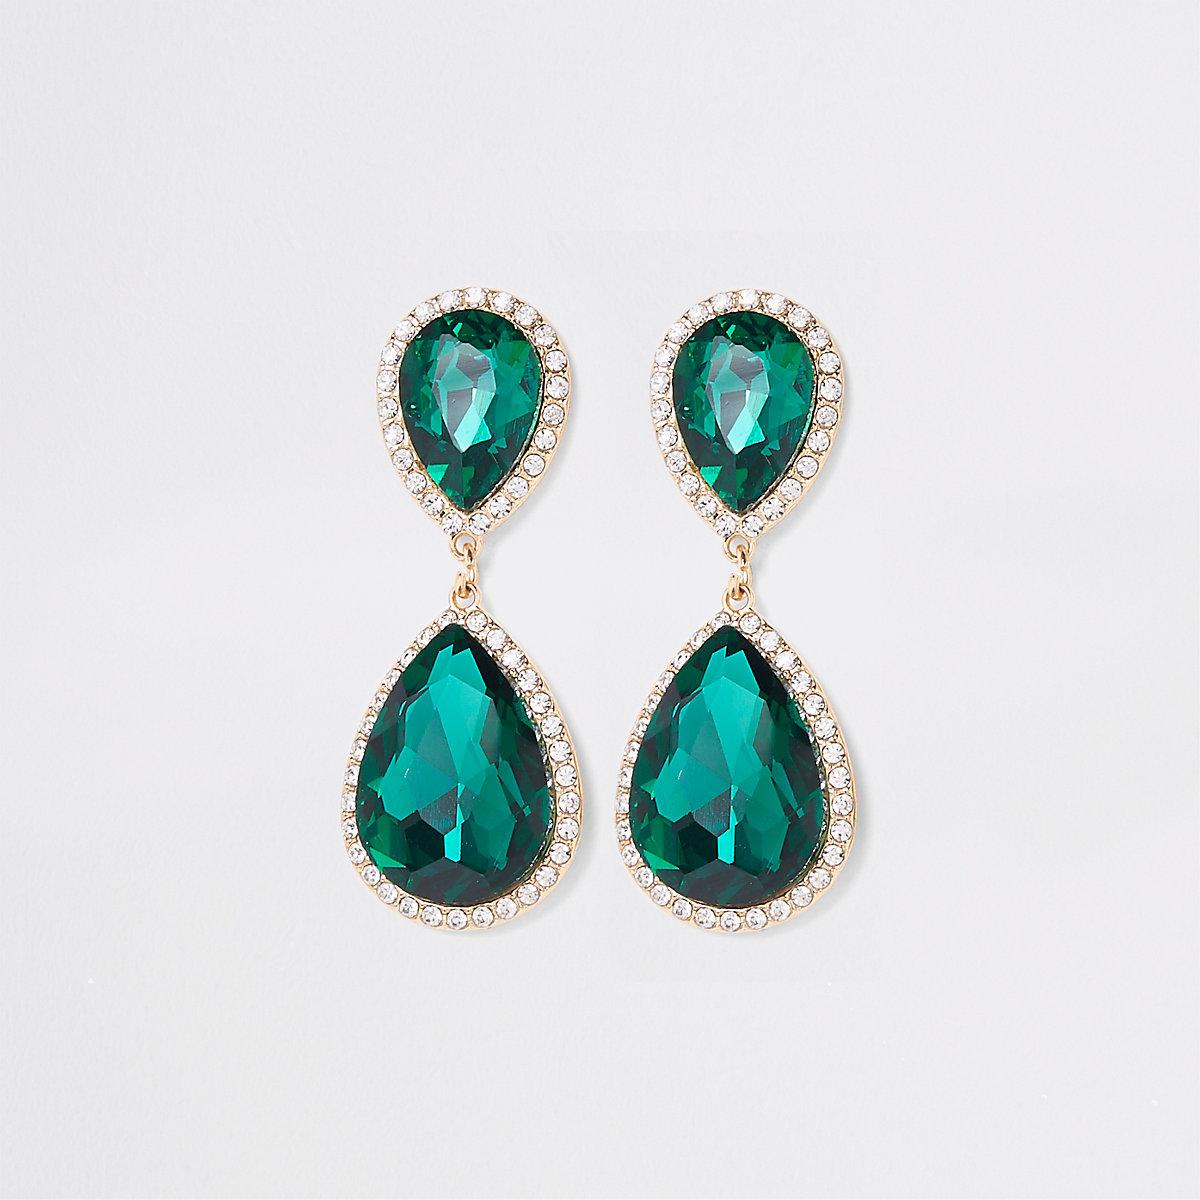 Gold tone emerald stone drop earrings